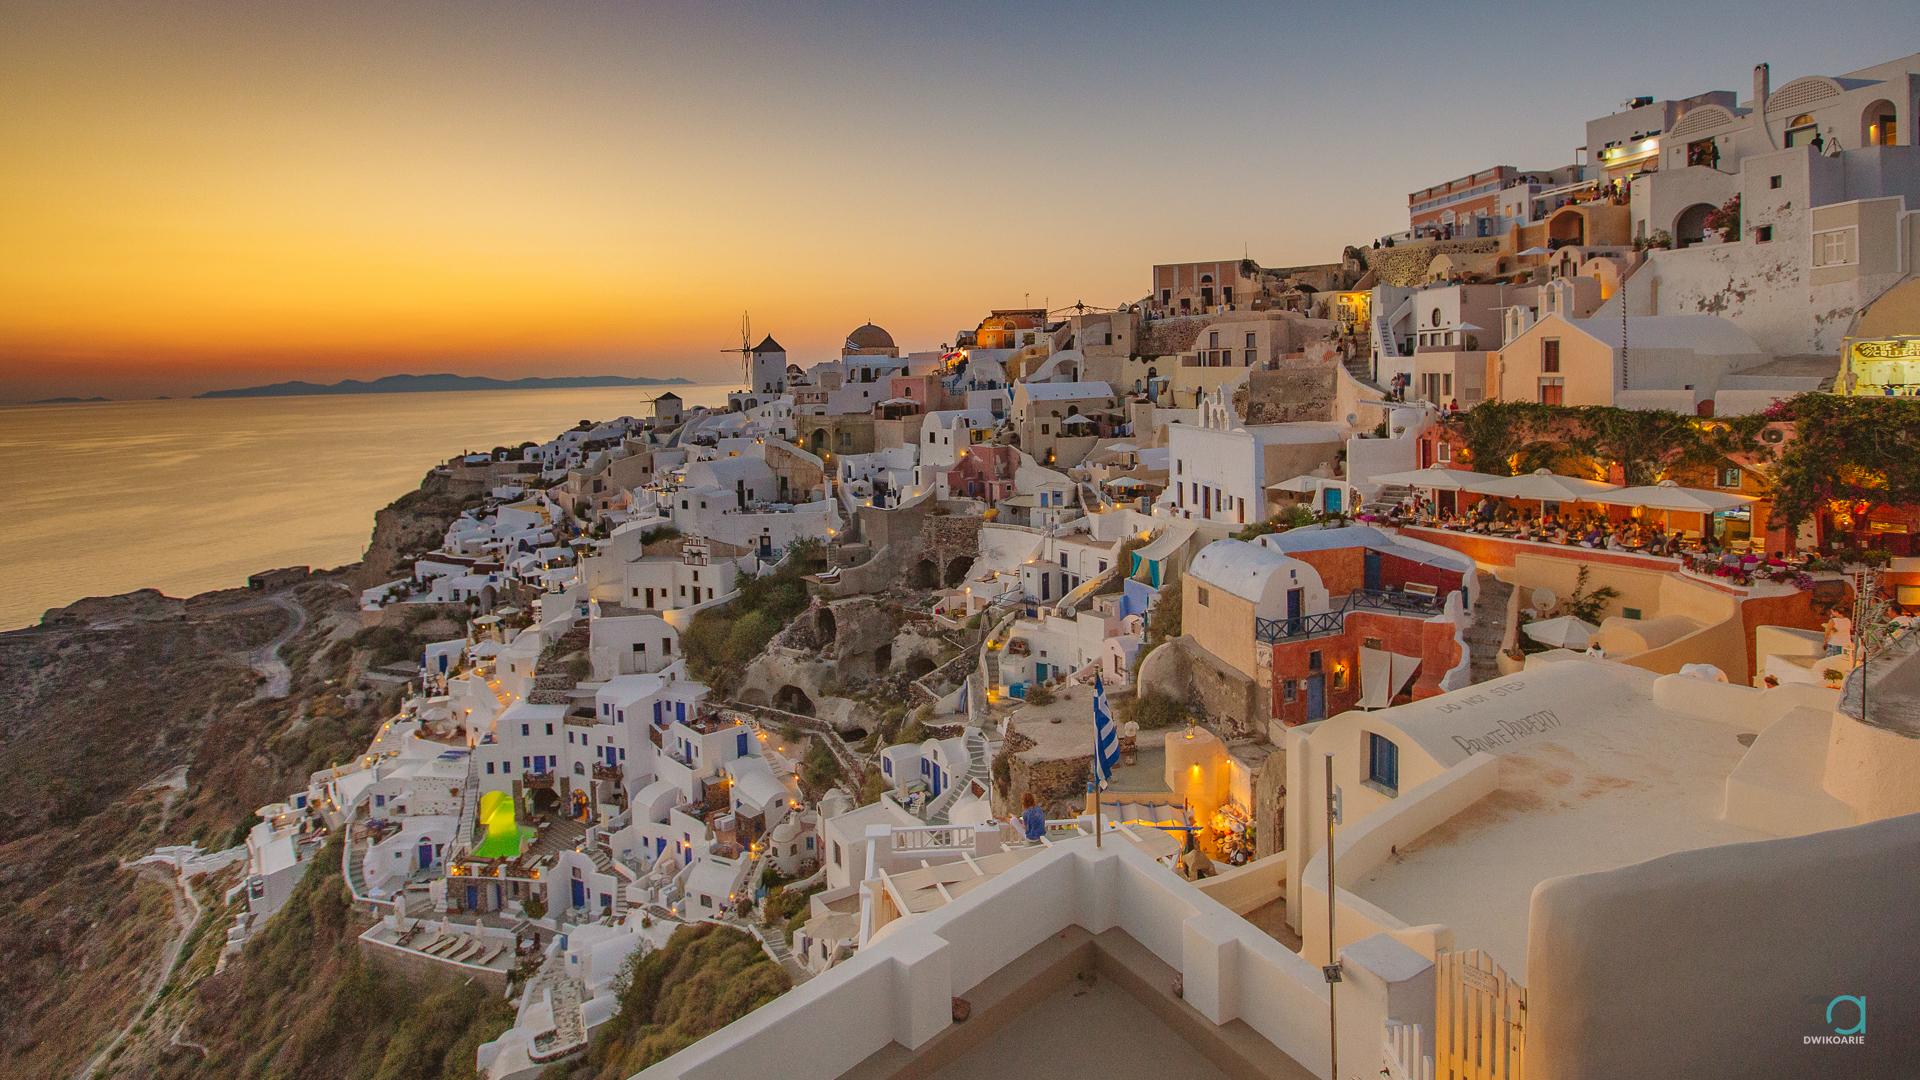 Santorini Travel Photography